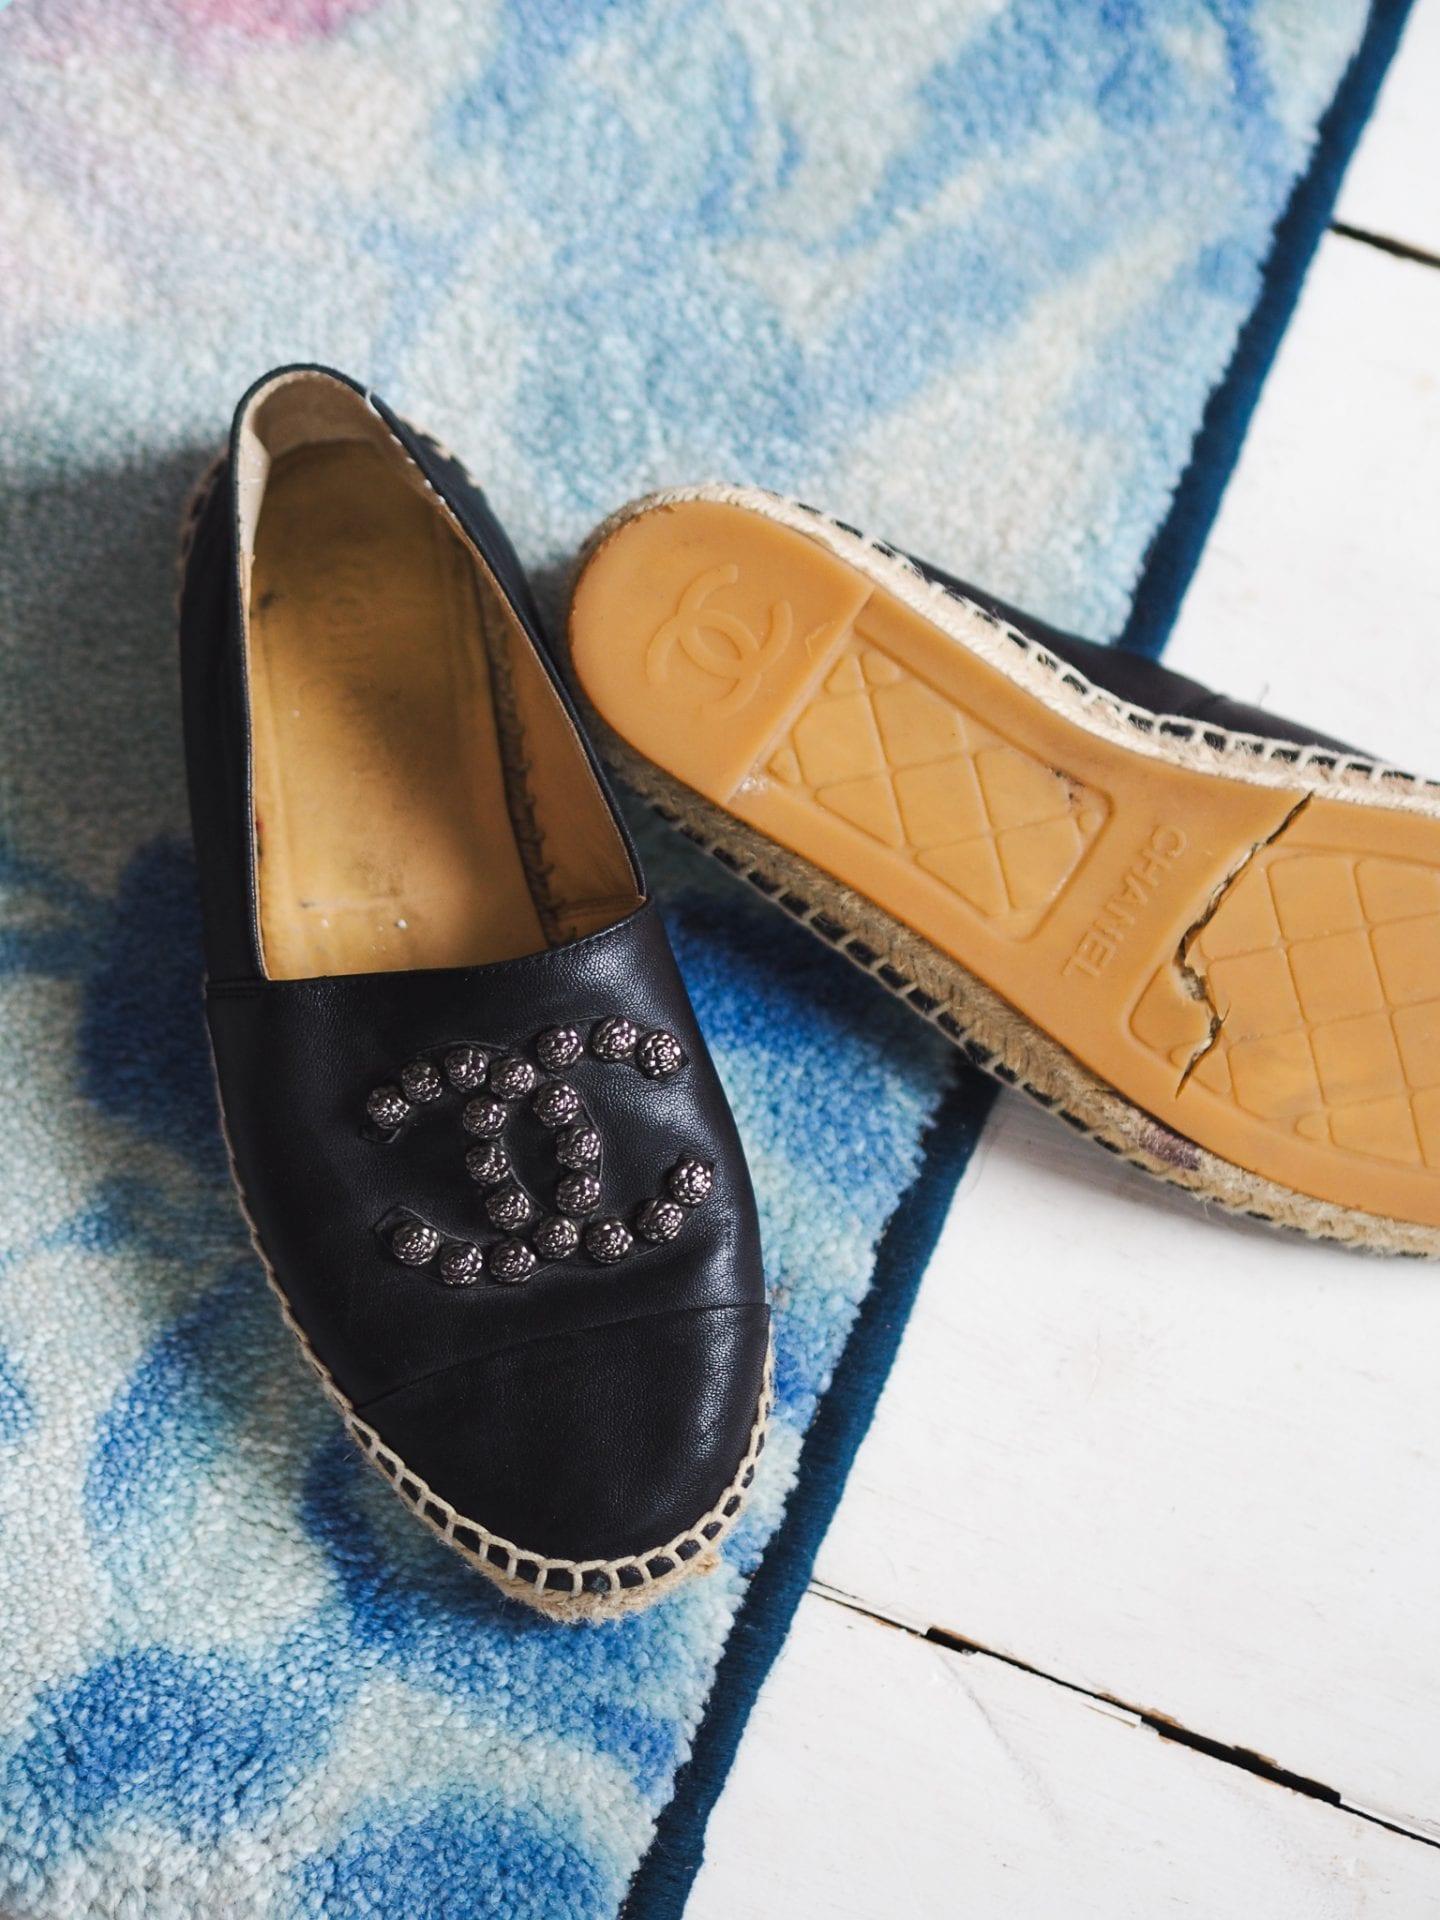 chanel-espadrilles-review-soles-of-shoes-rubber